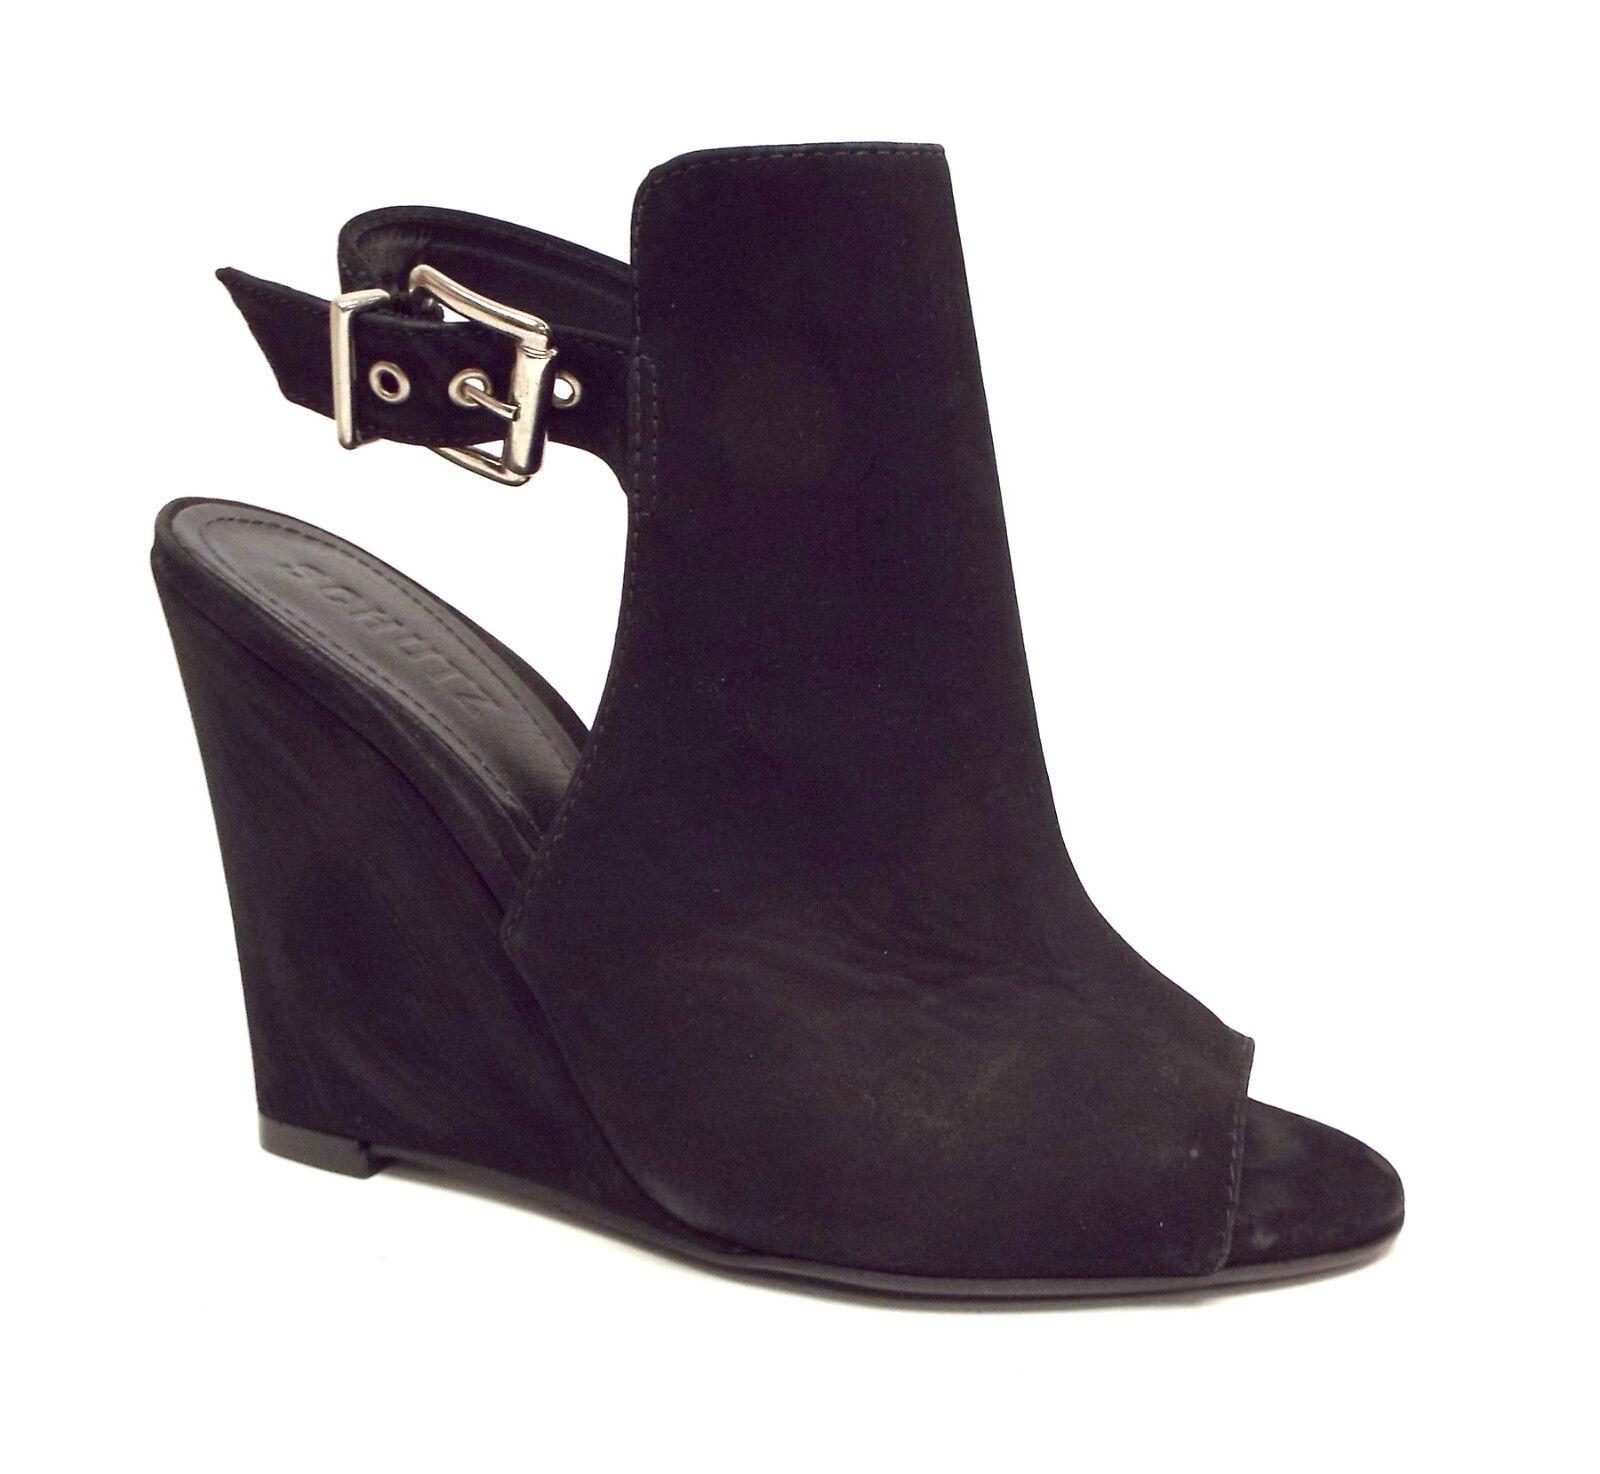 SCHUTZ Size 7 Black Nubuck Mantle Wedges Heels shoes 38